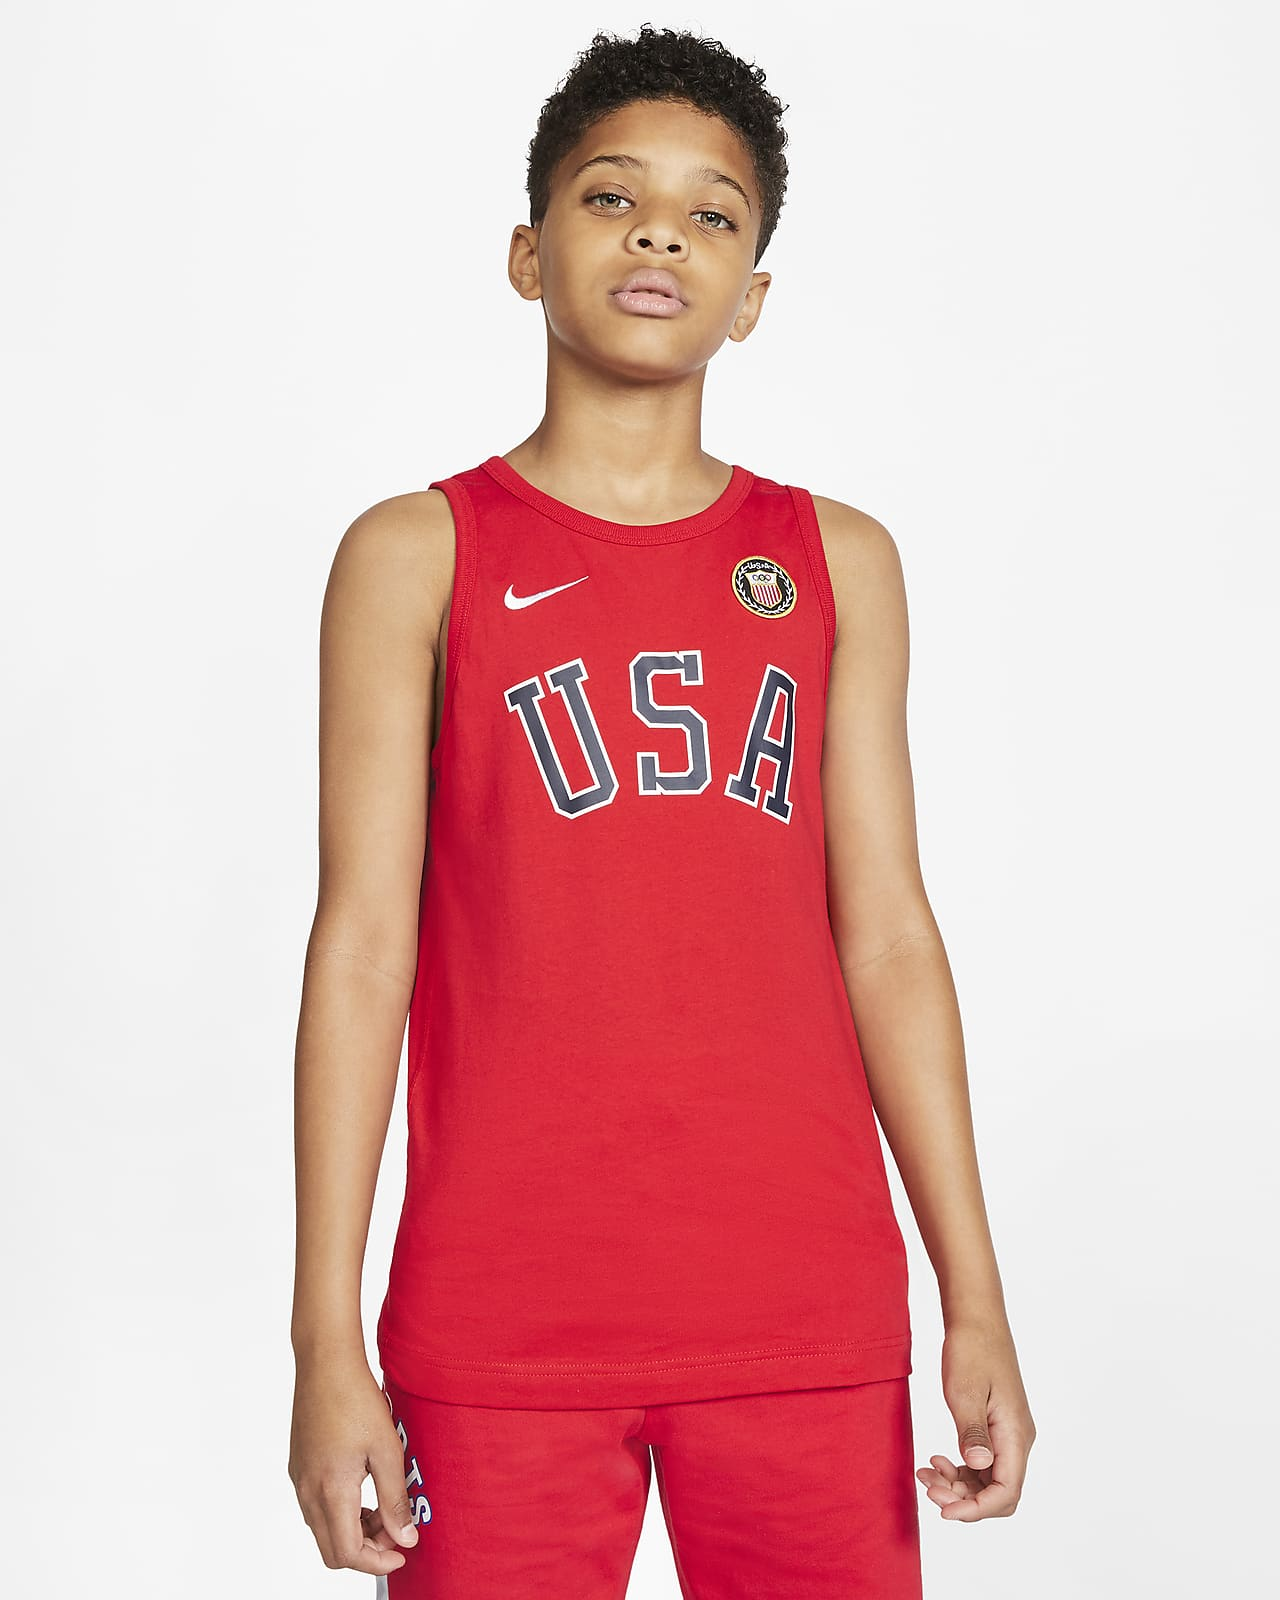 Nike Sportswear Team USA Big Kids' (Boys') Tank